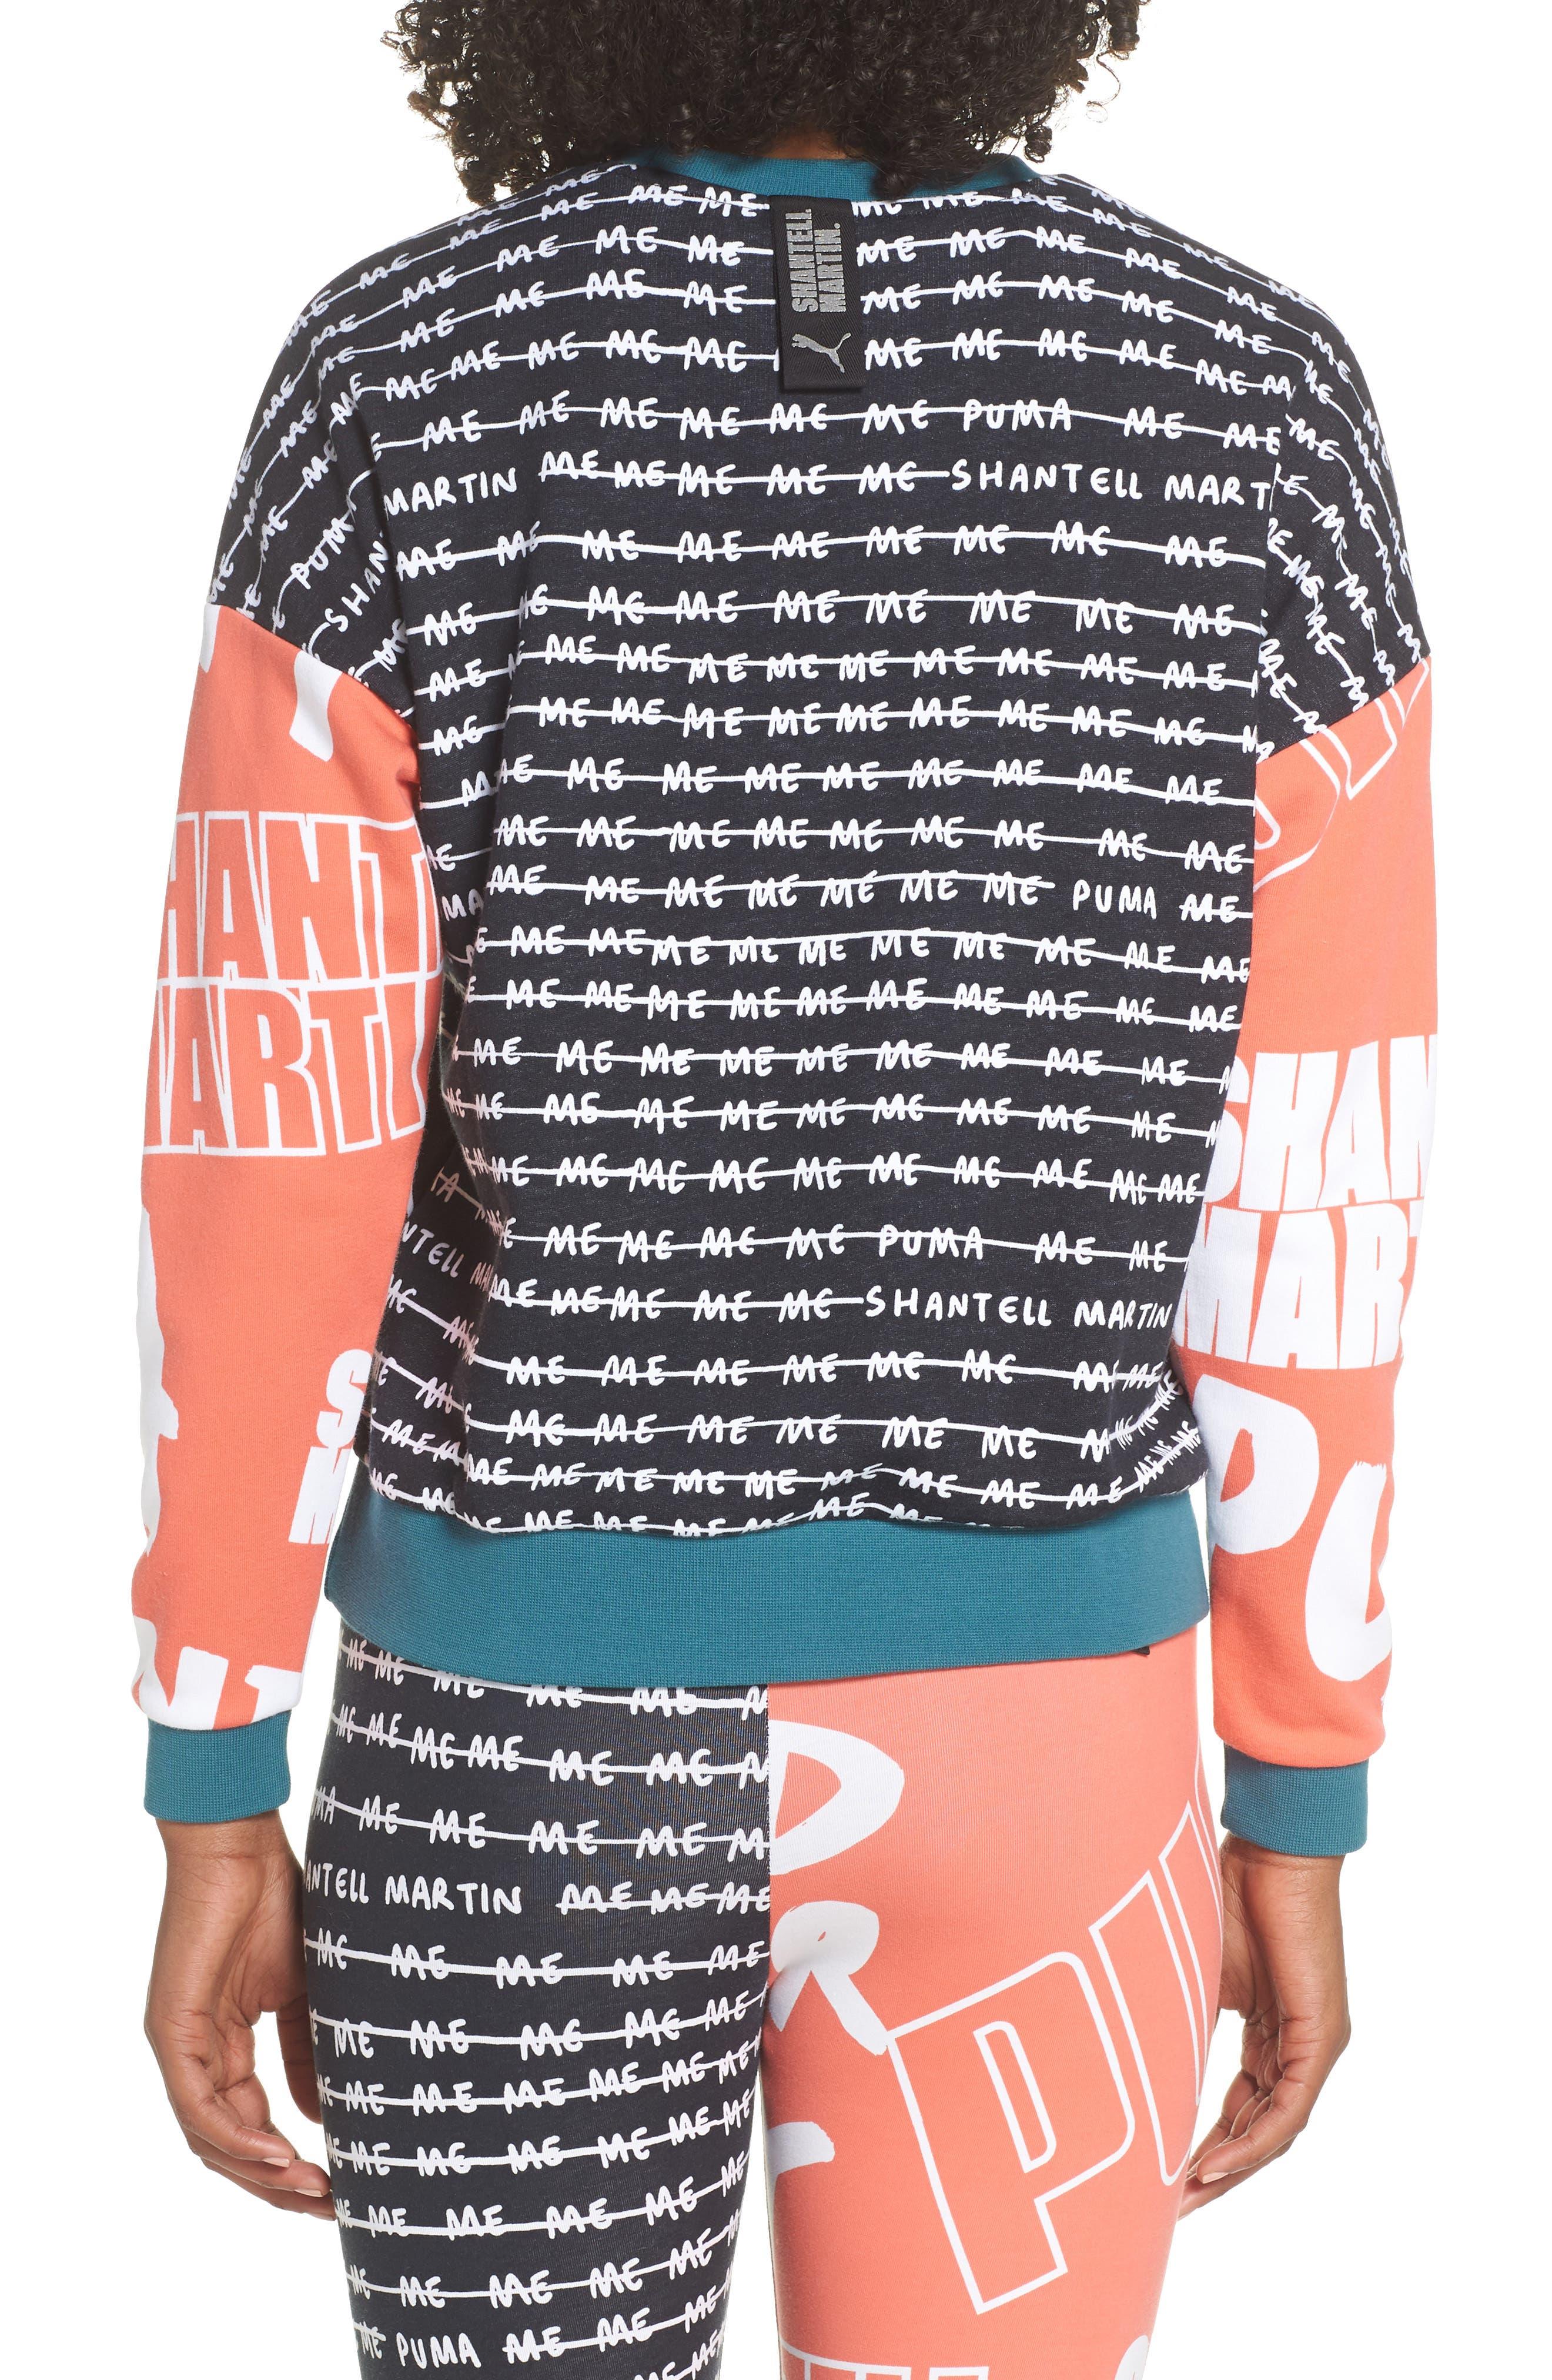 X Shantell Martin Sweatshirt,                             Alternate thumbnail 2, color,                             PUMA BLACK